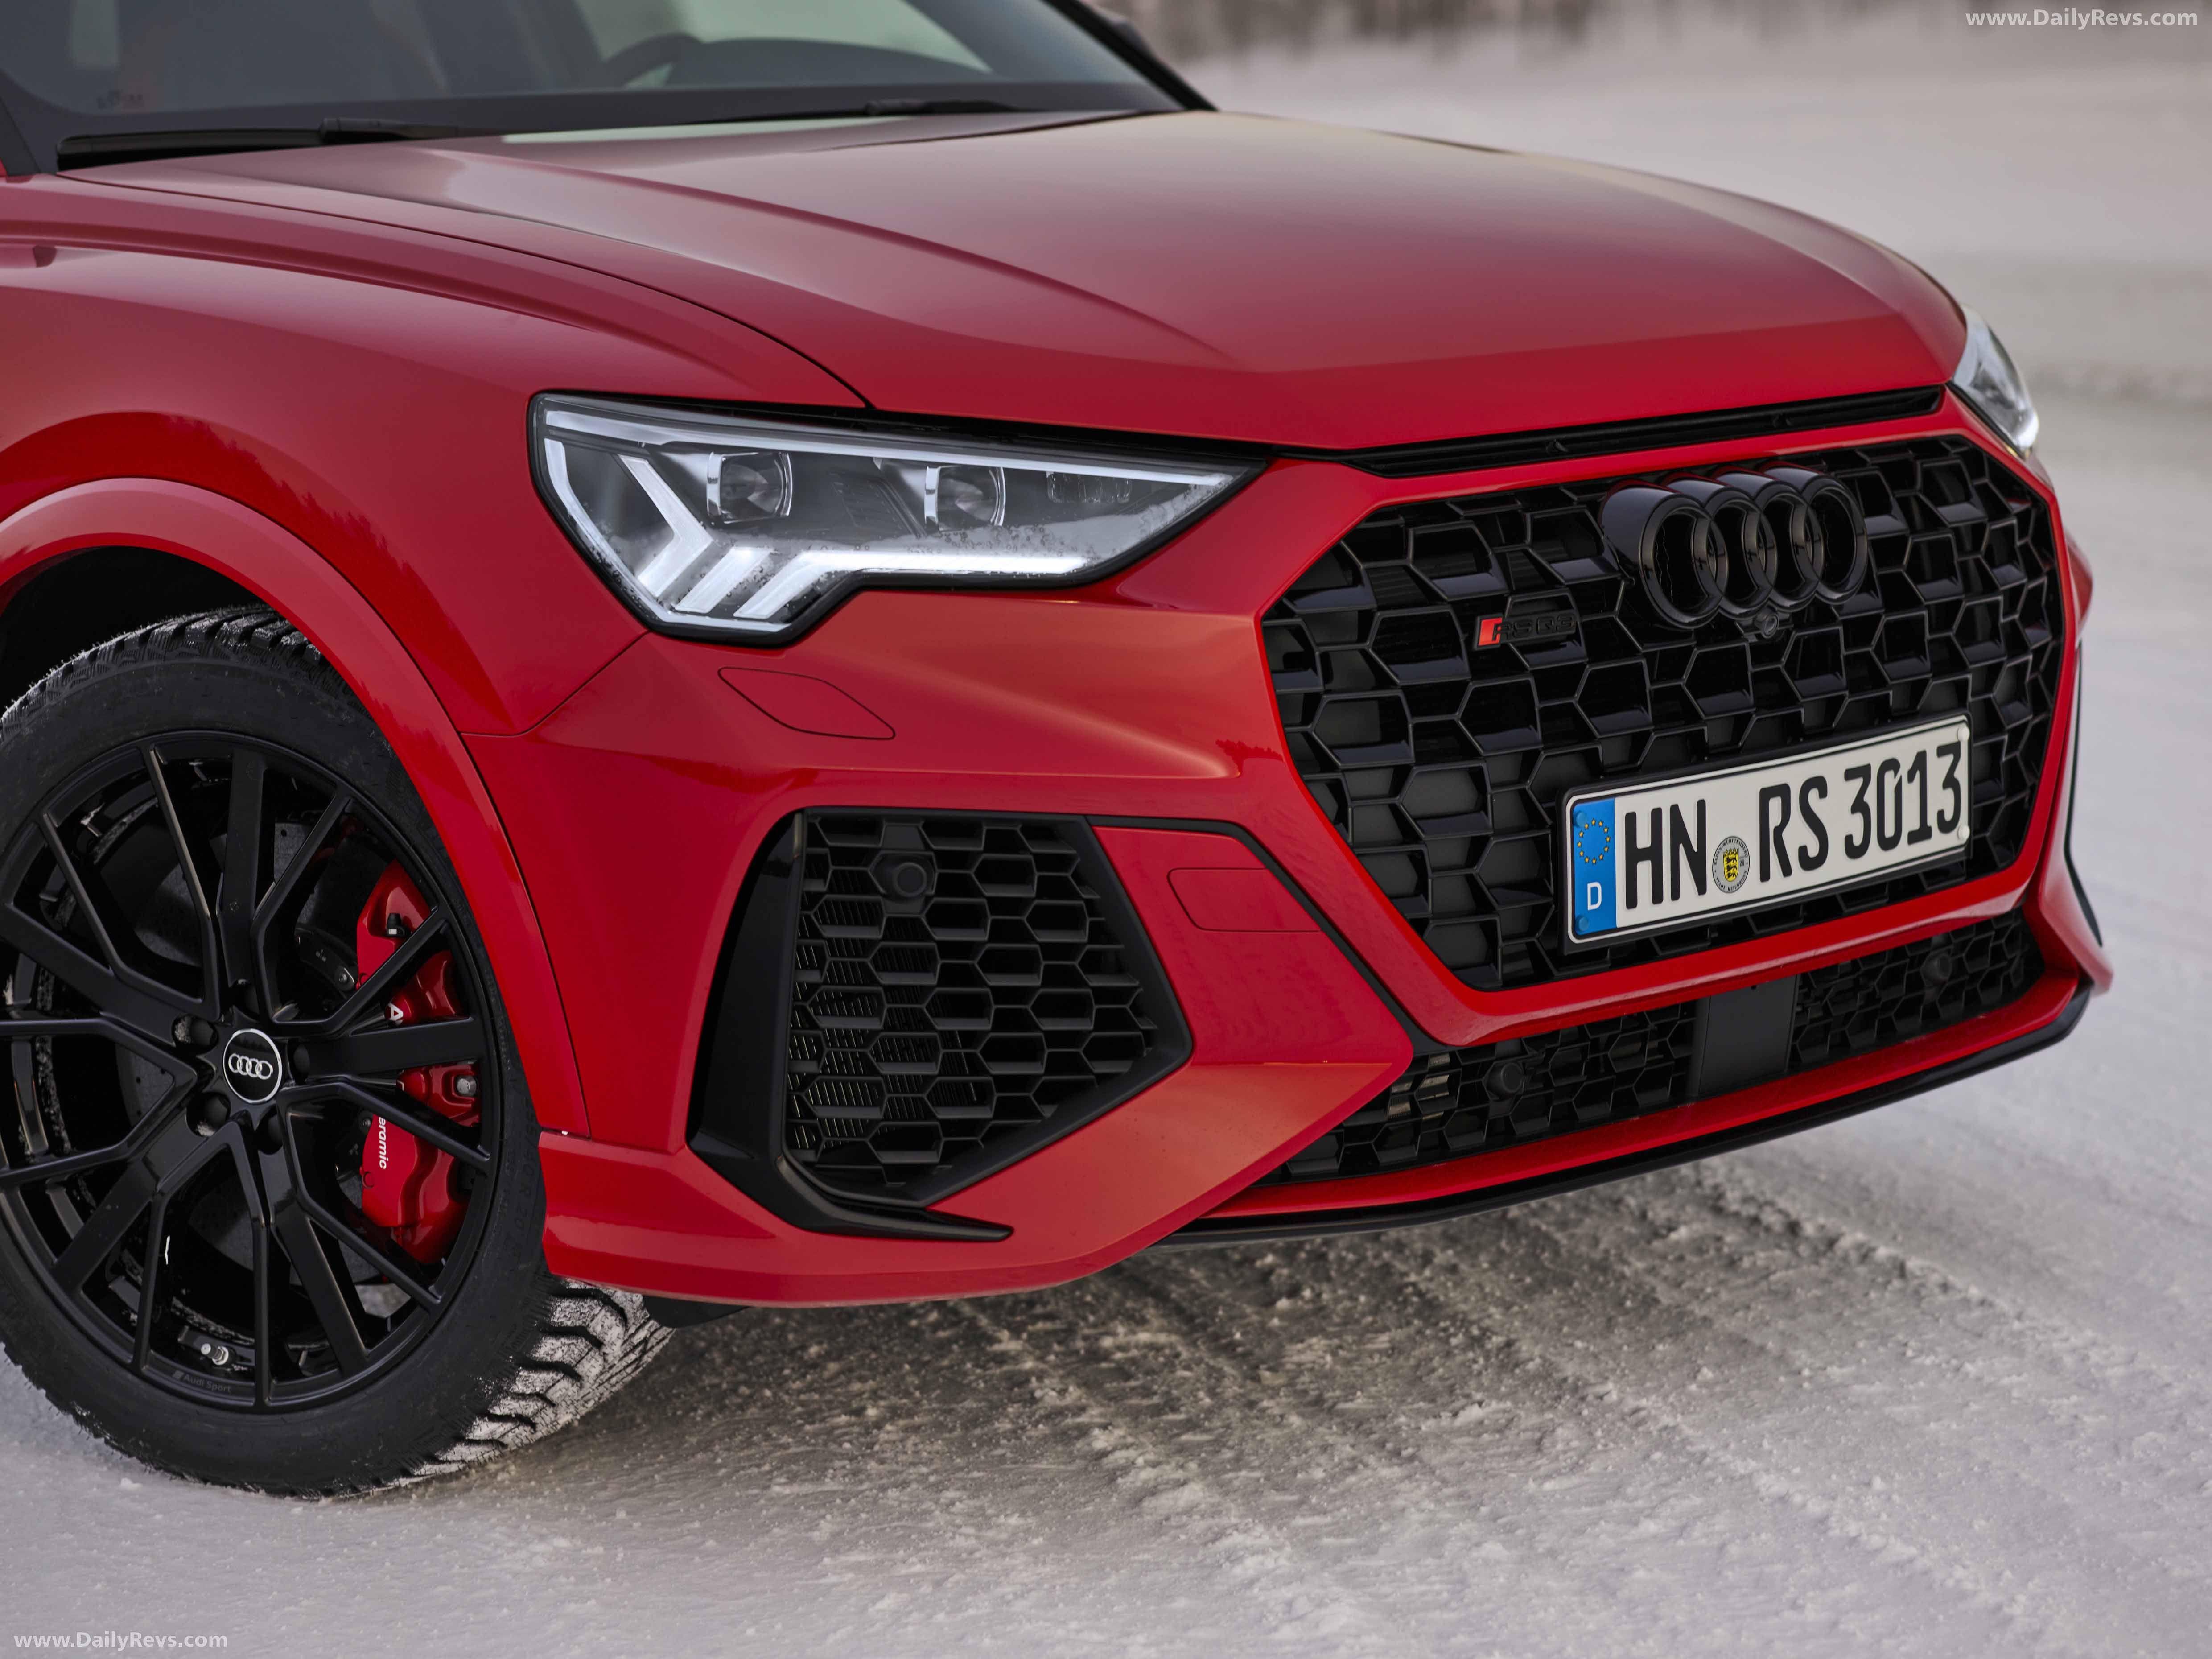 2020 Audi RS Q3 in 2020 Audi, Audi rs